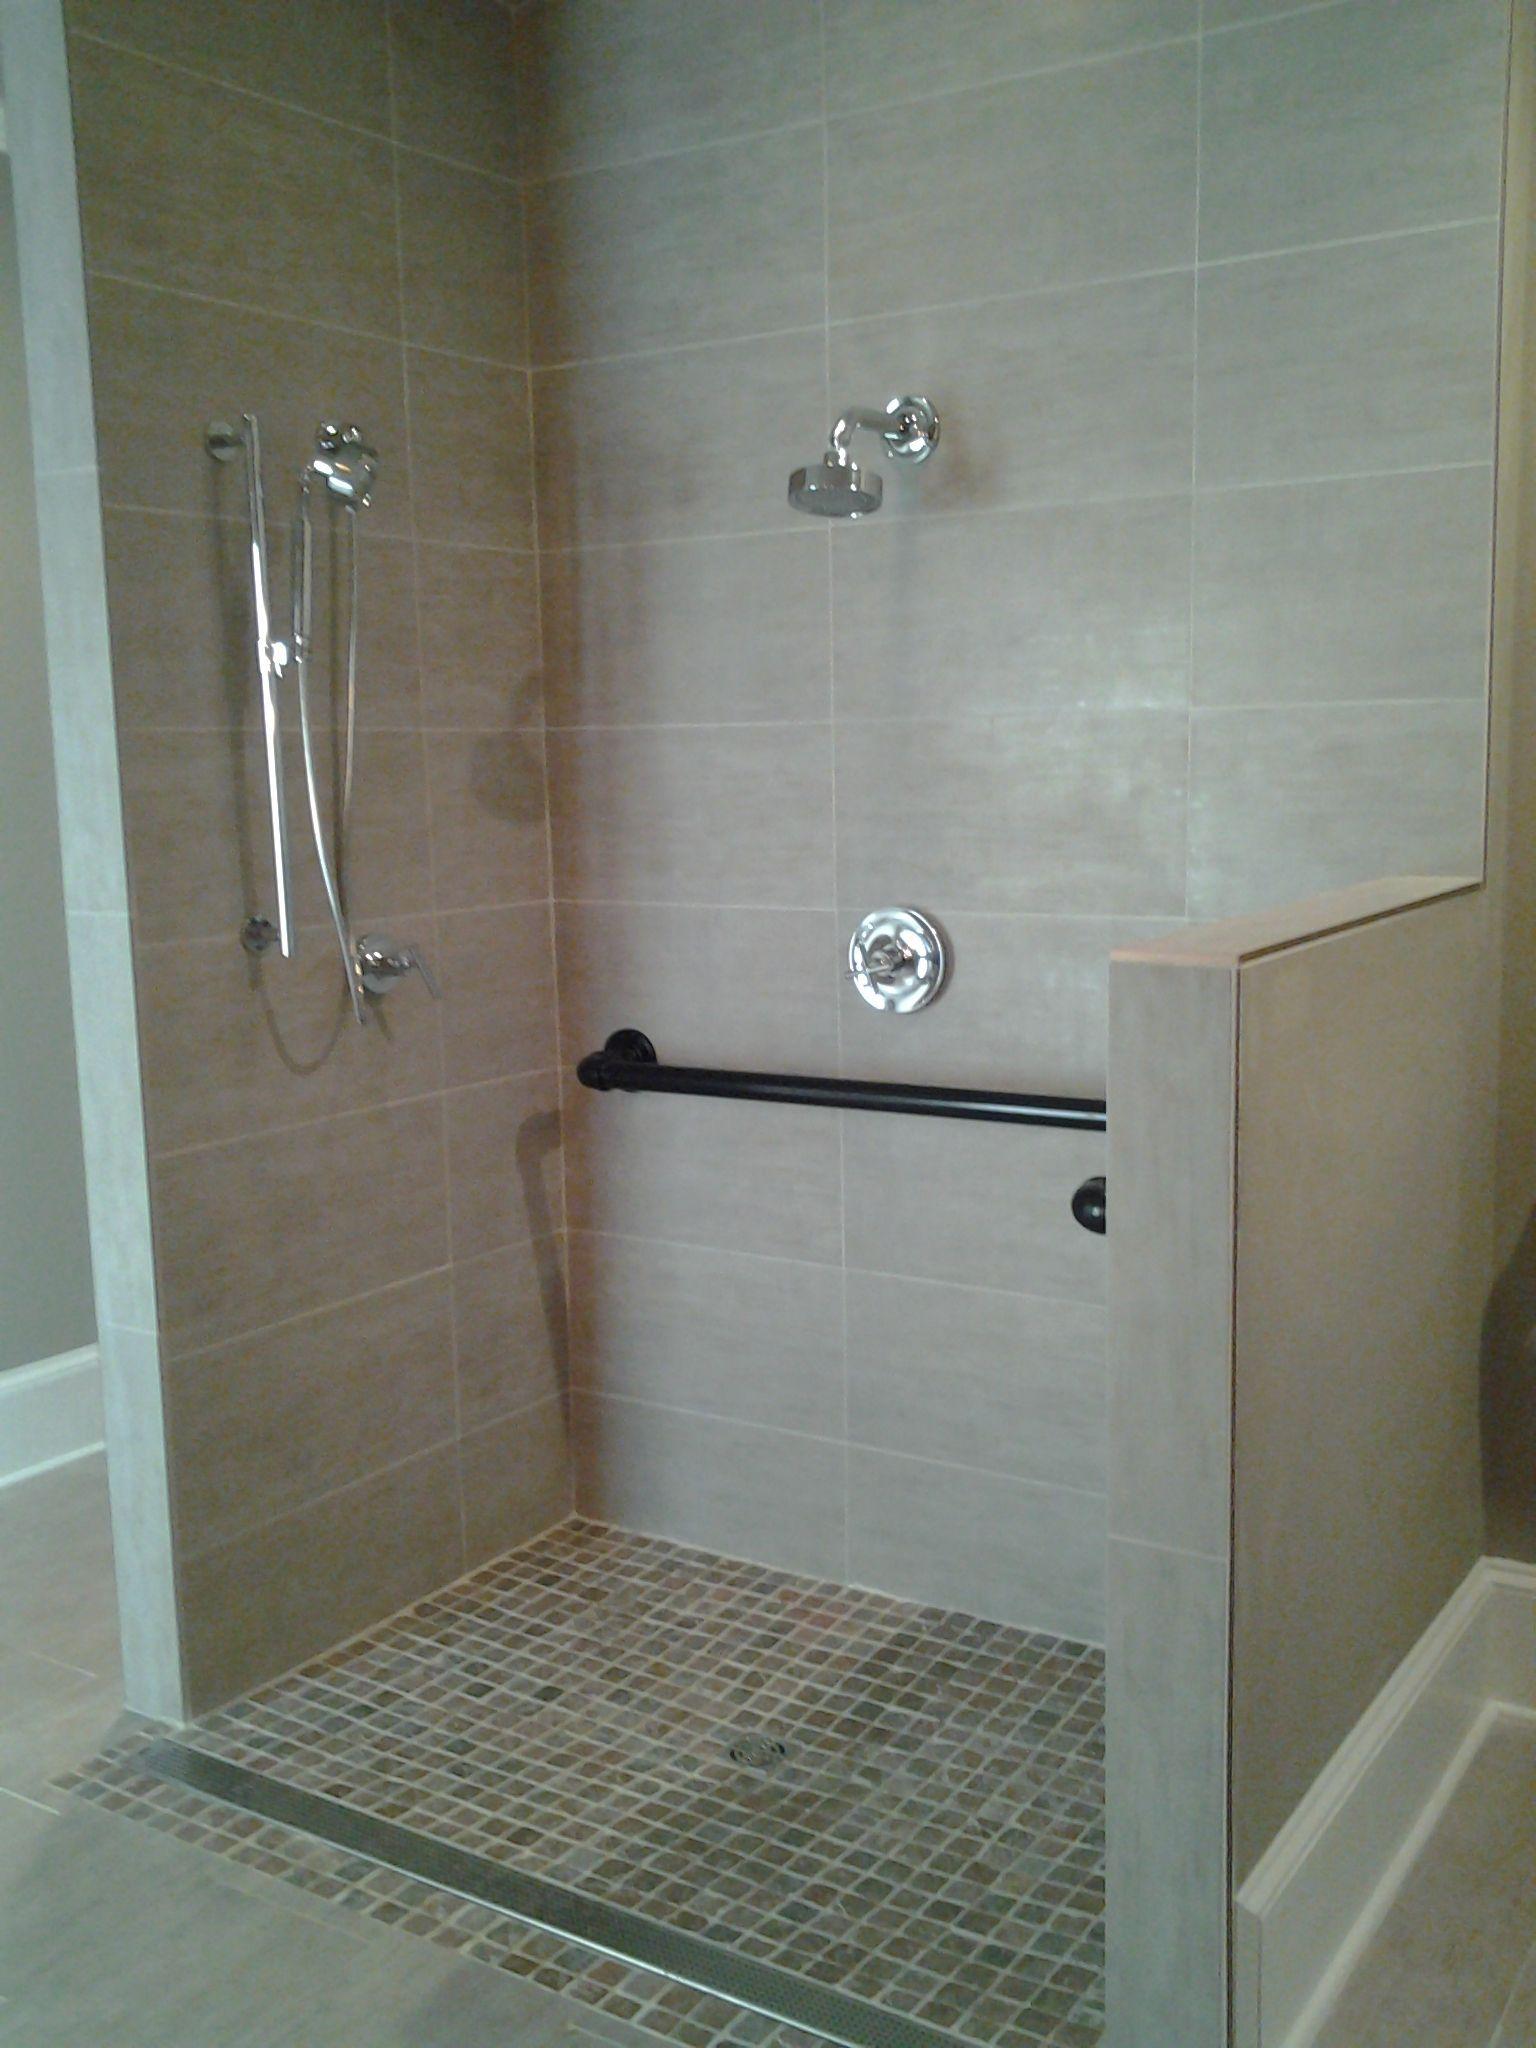 Handicap Bathroom Grab Bar Placement Bathroomredo Bathroomgoals